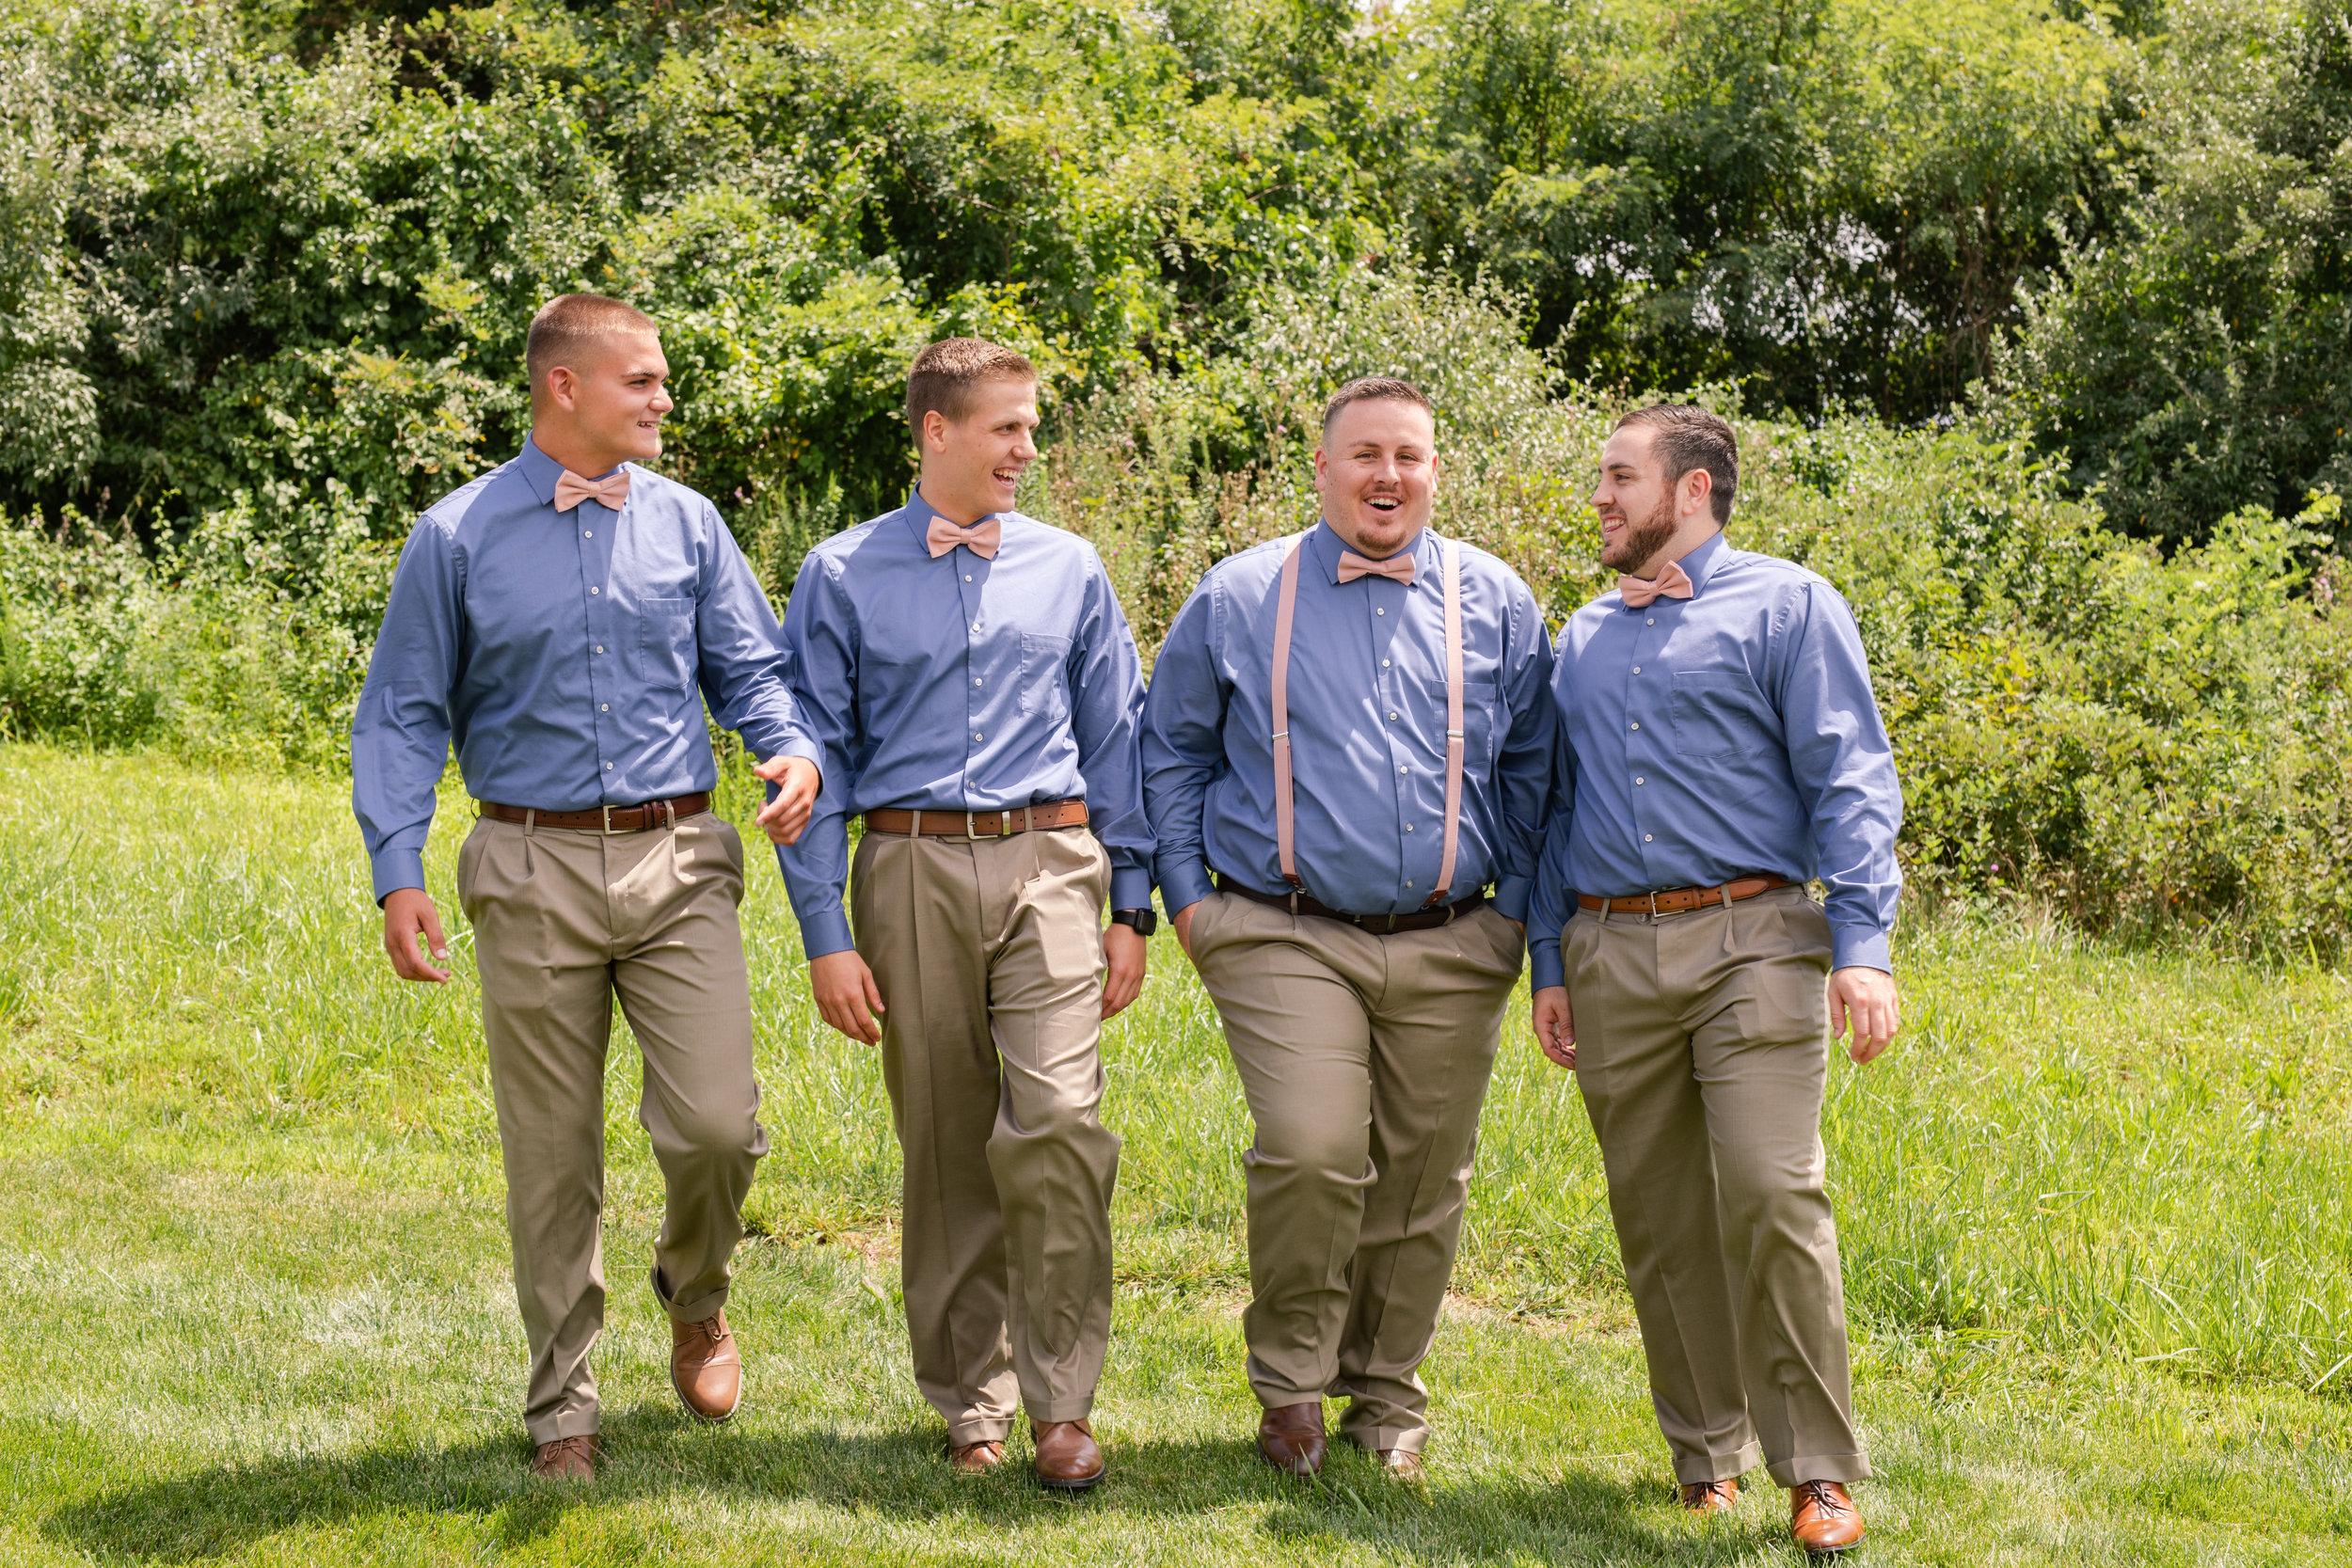 Staunton virginia wedding photographer photo_5180.jpg